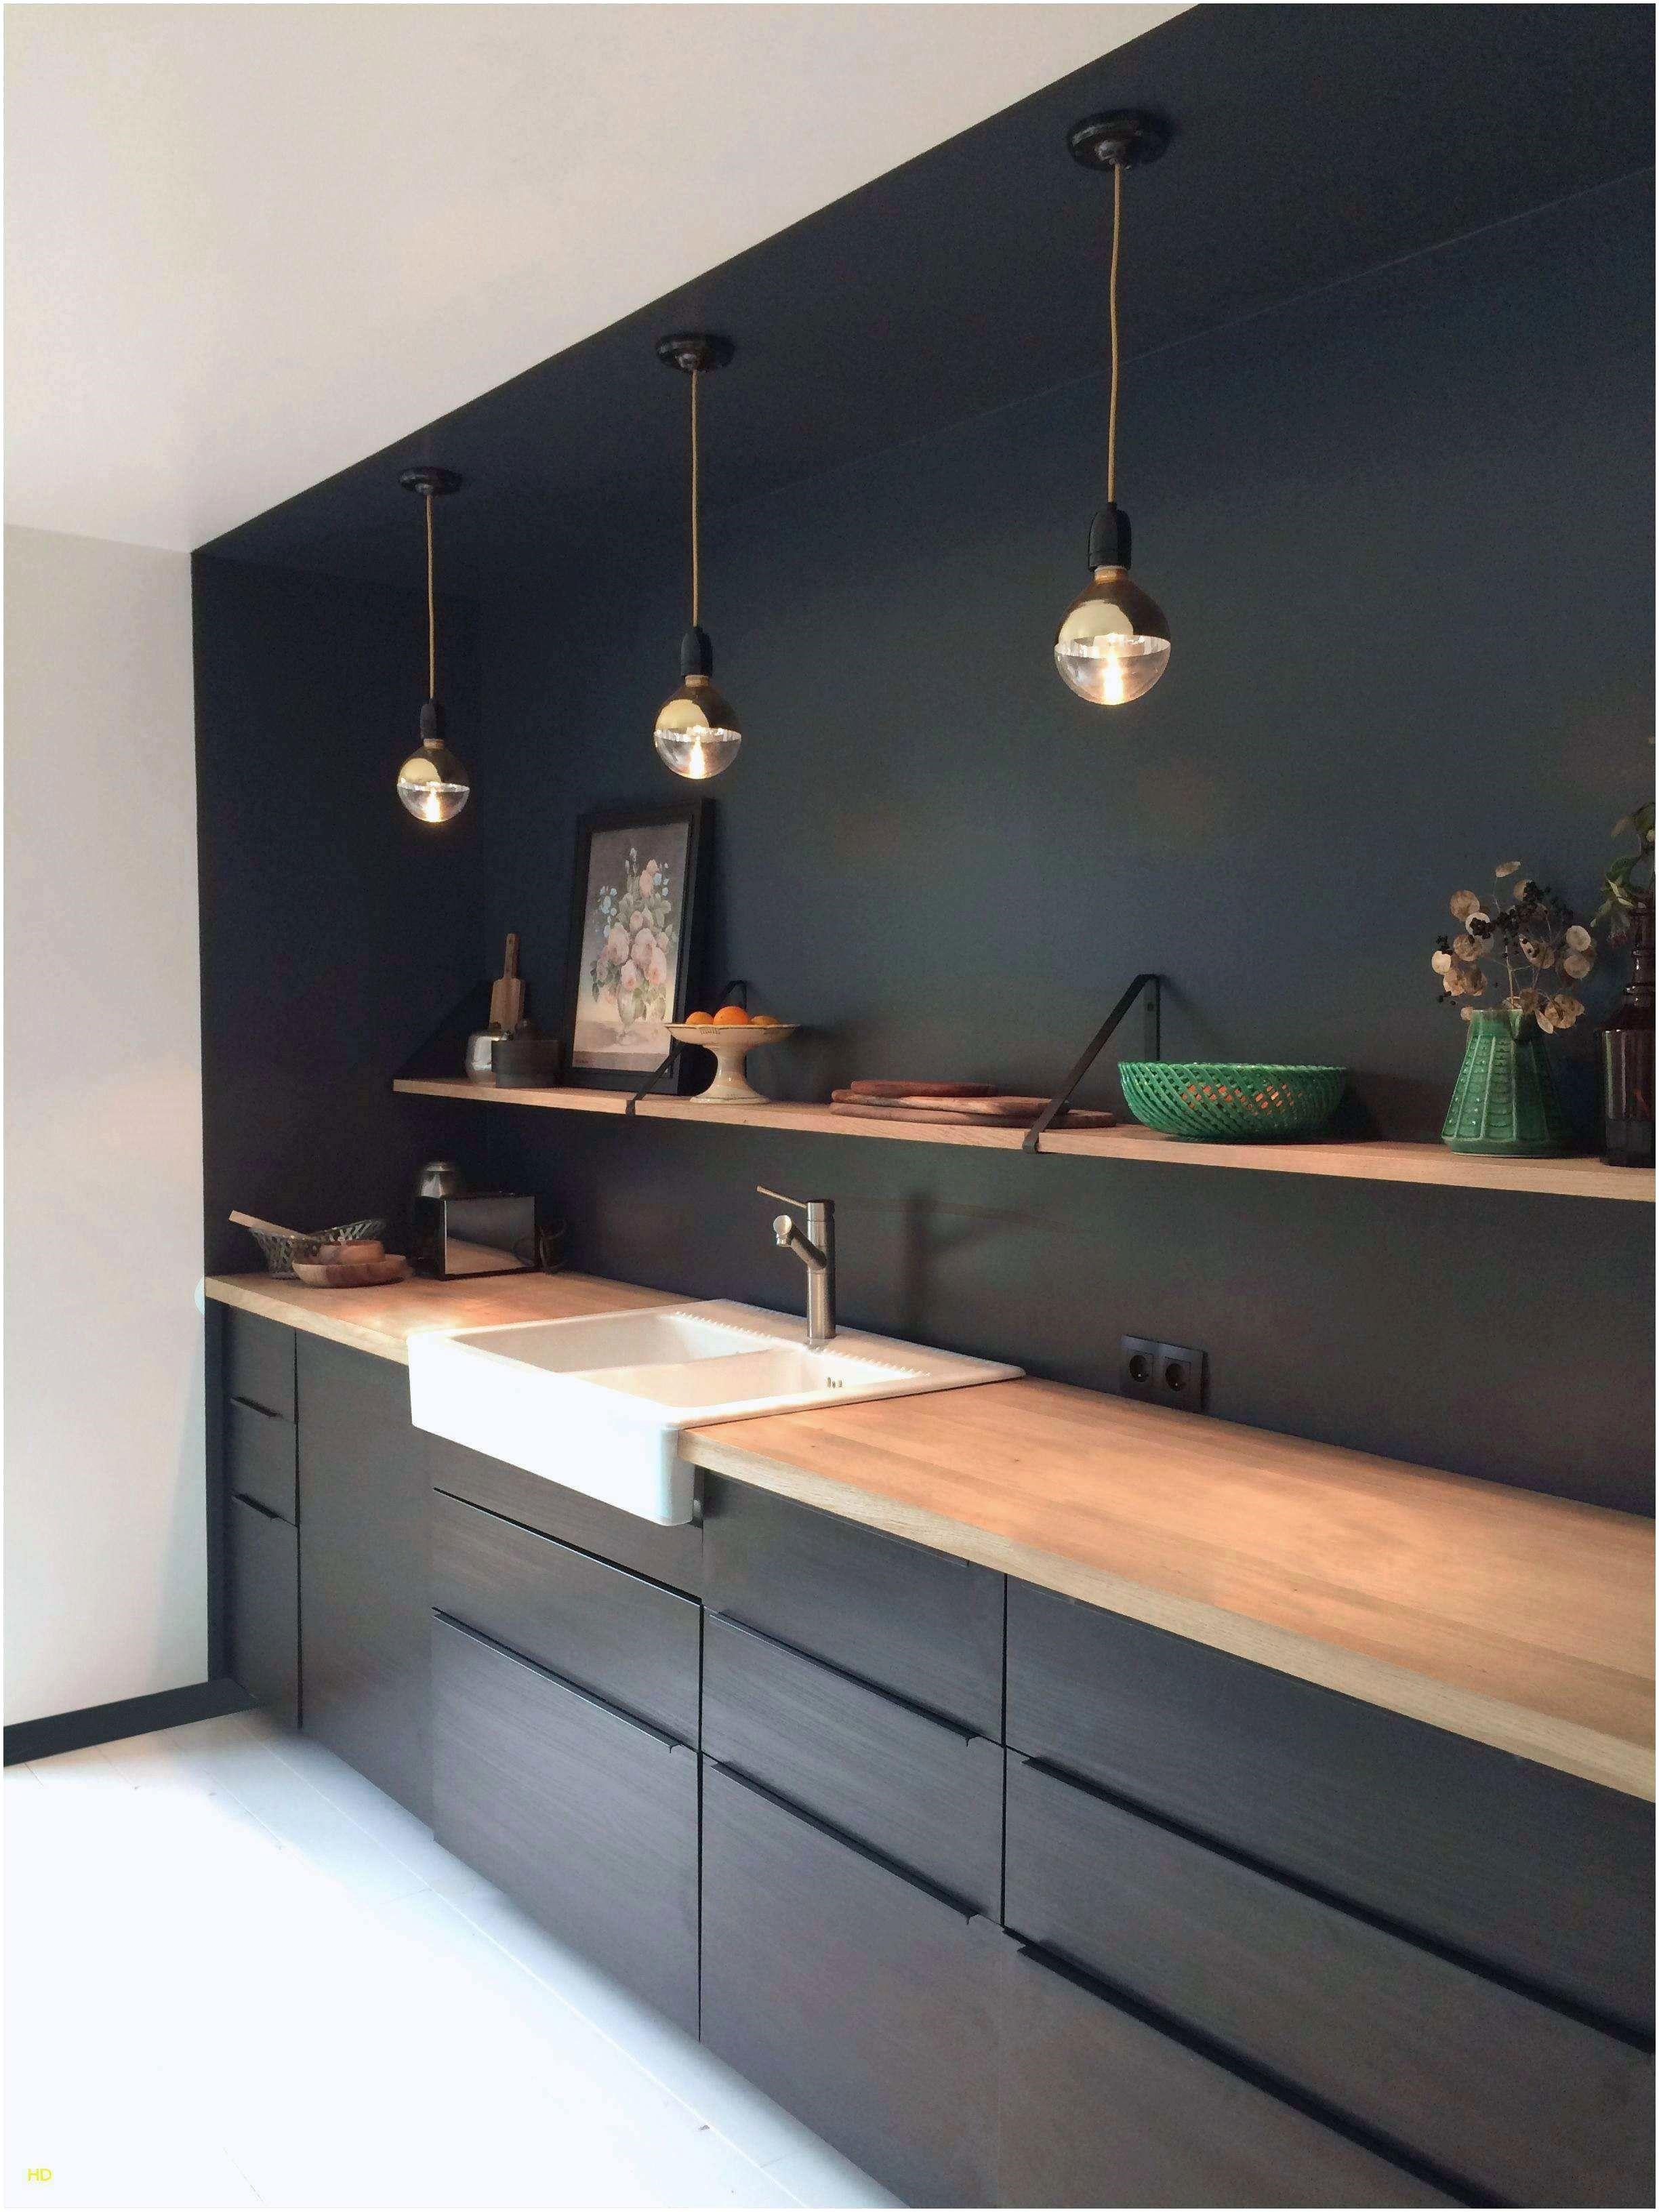 Inspir Ikea Catalogue Cuisine Moderne Luxe Solde Cuisine Cuisine Ikea Catalogue In 2020 Ikea Kitchen Design Kitchen Cabinet Design Kitchen Interior